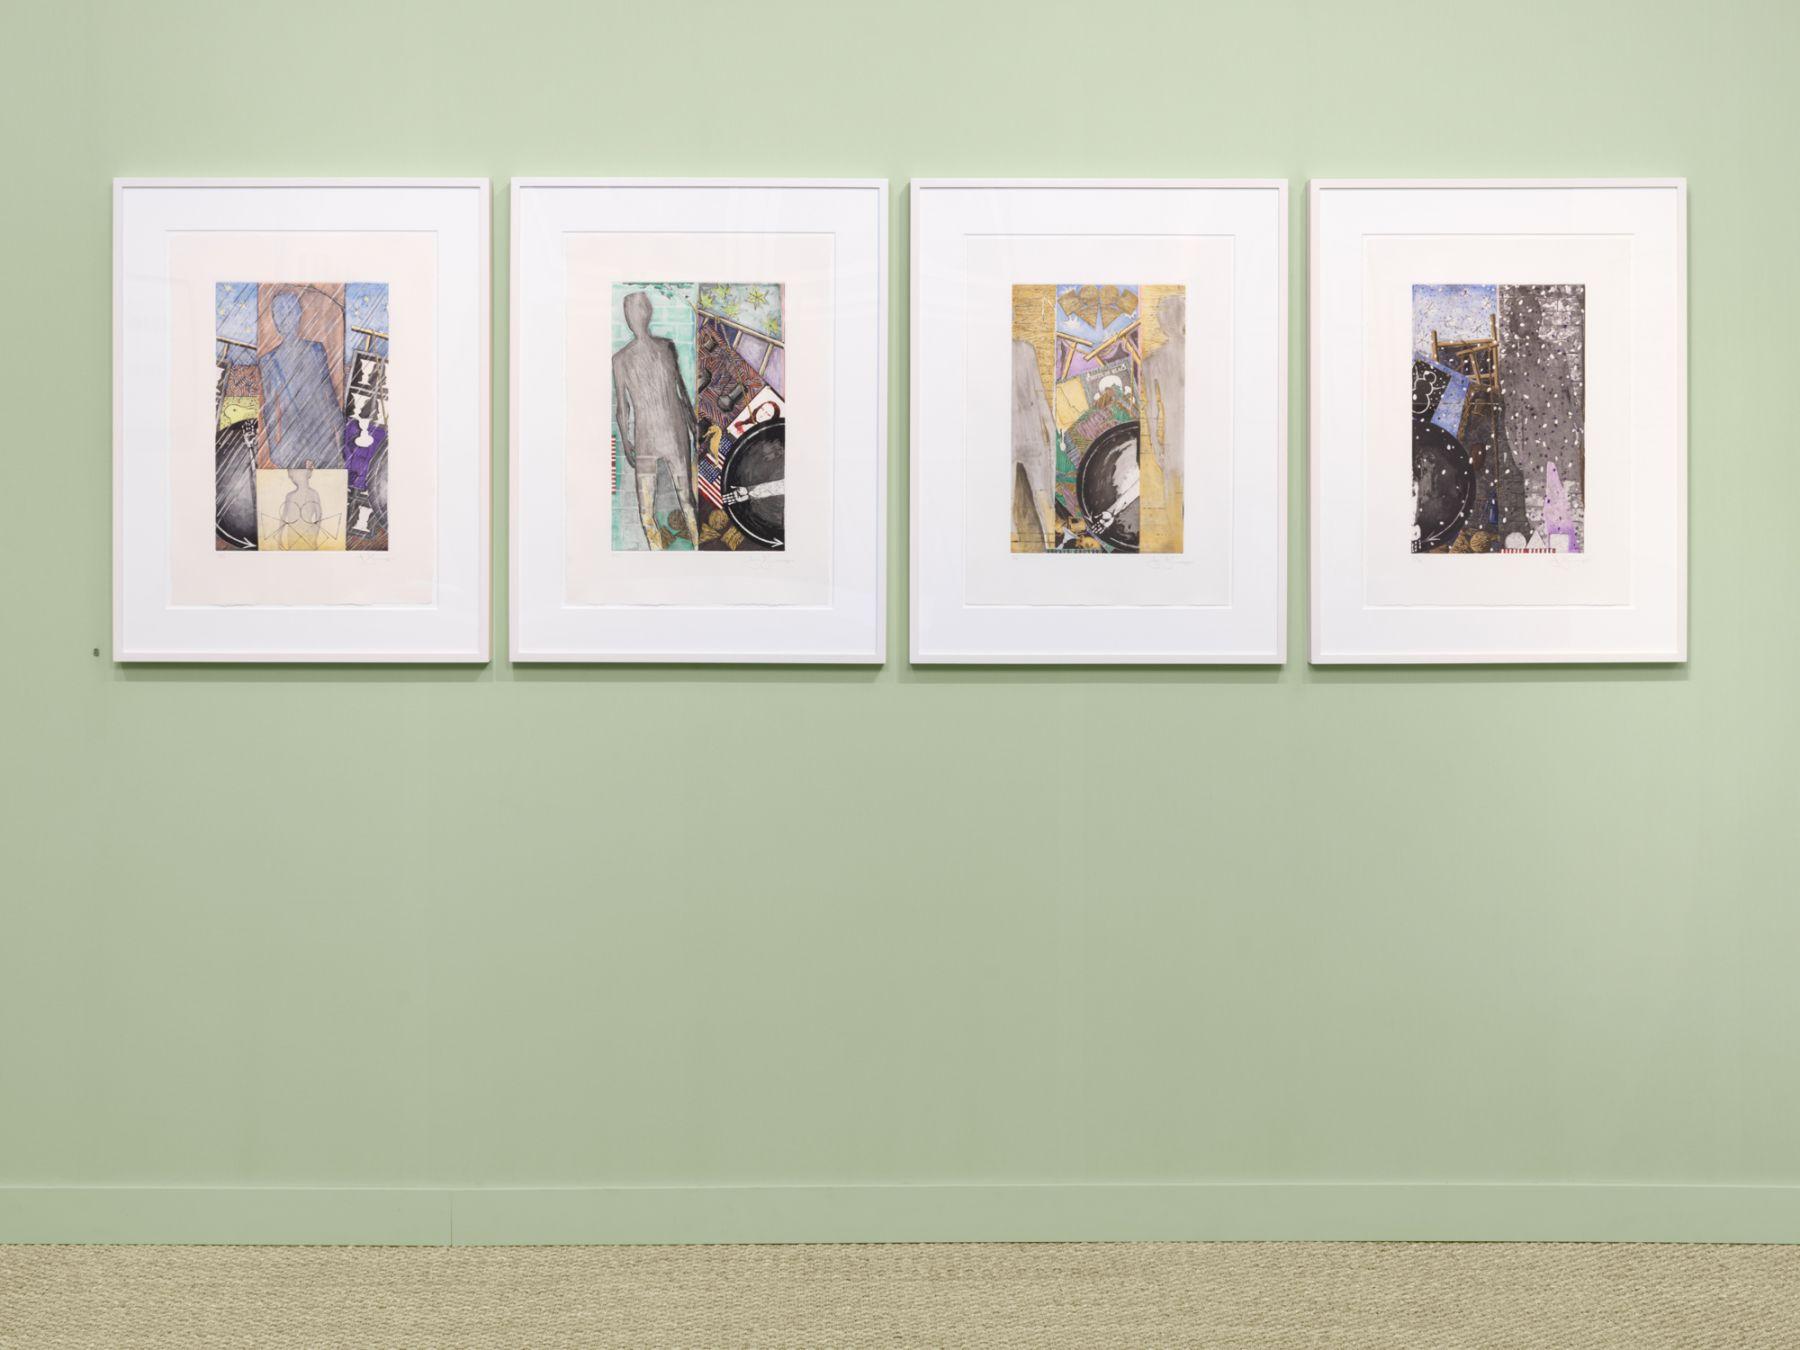 The IFPDA Print Fair 20119 at the Susan Sheehan Gallery